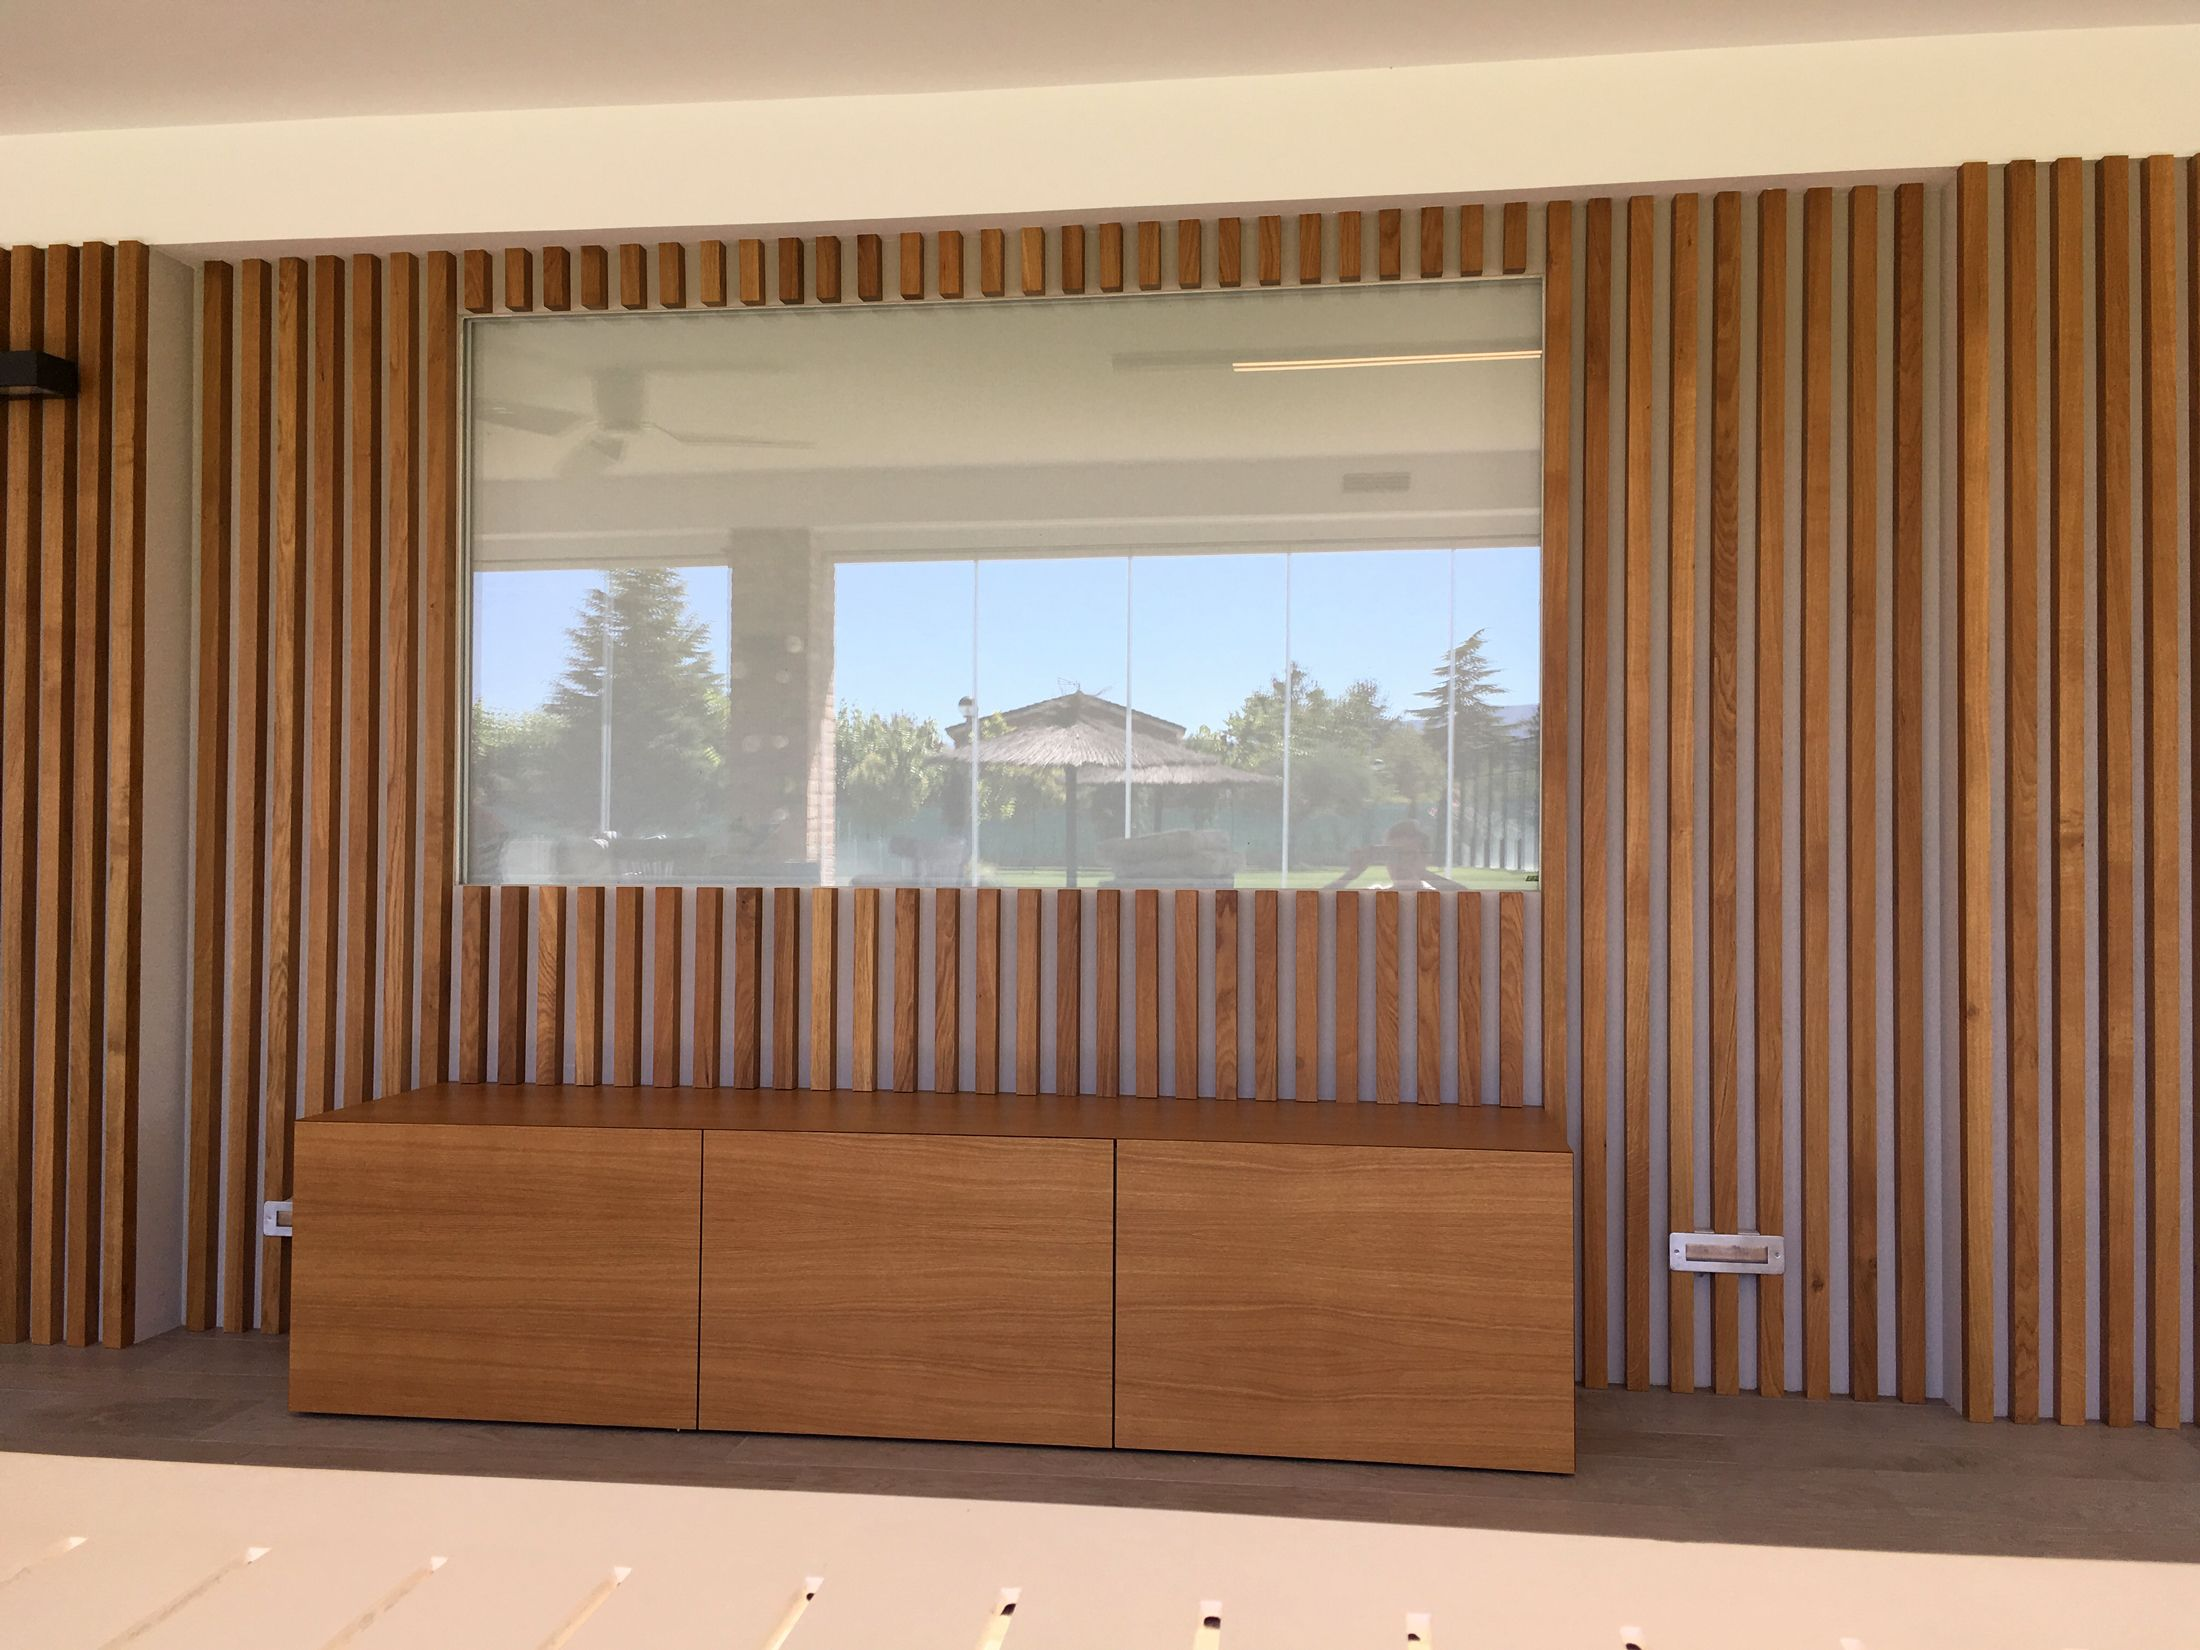 Interiorismo reforma finca privada segunda residencia | Perspectiva Moma